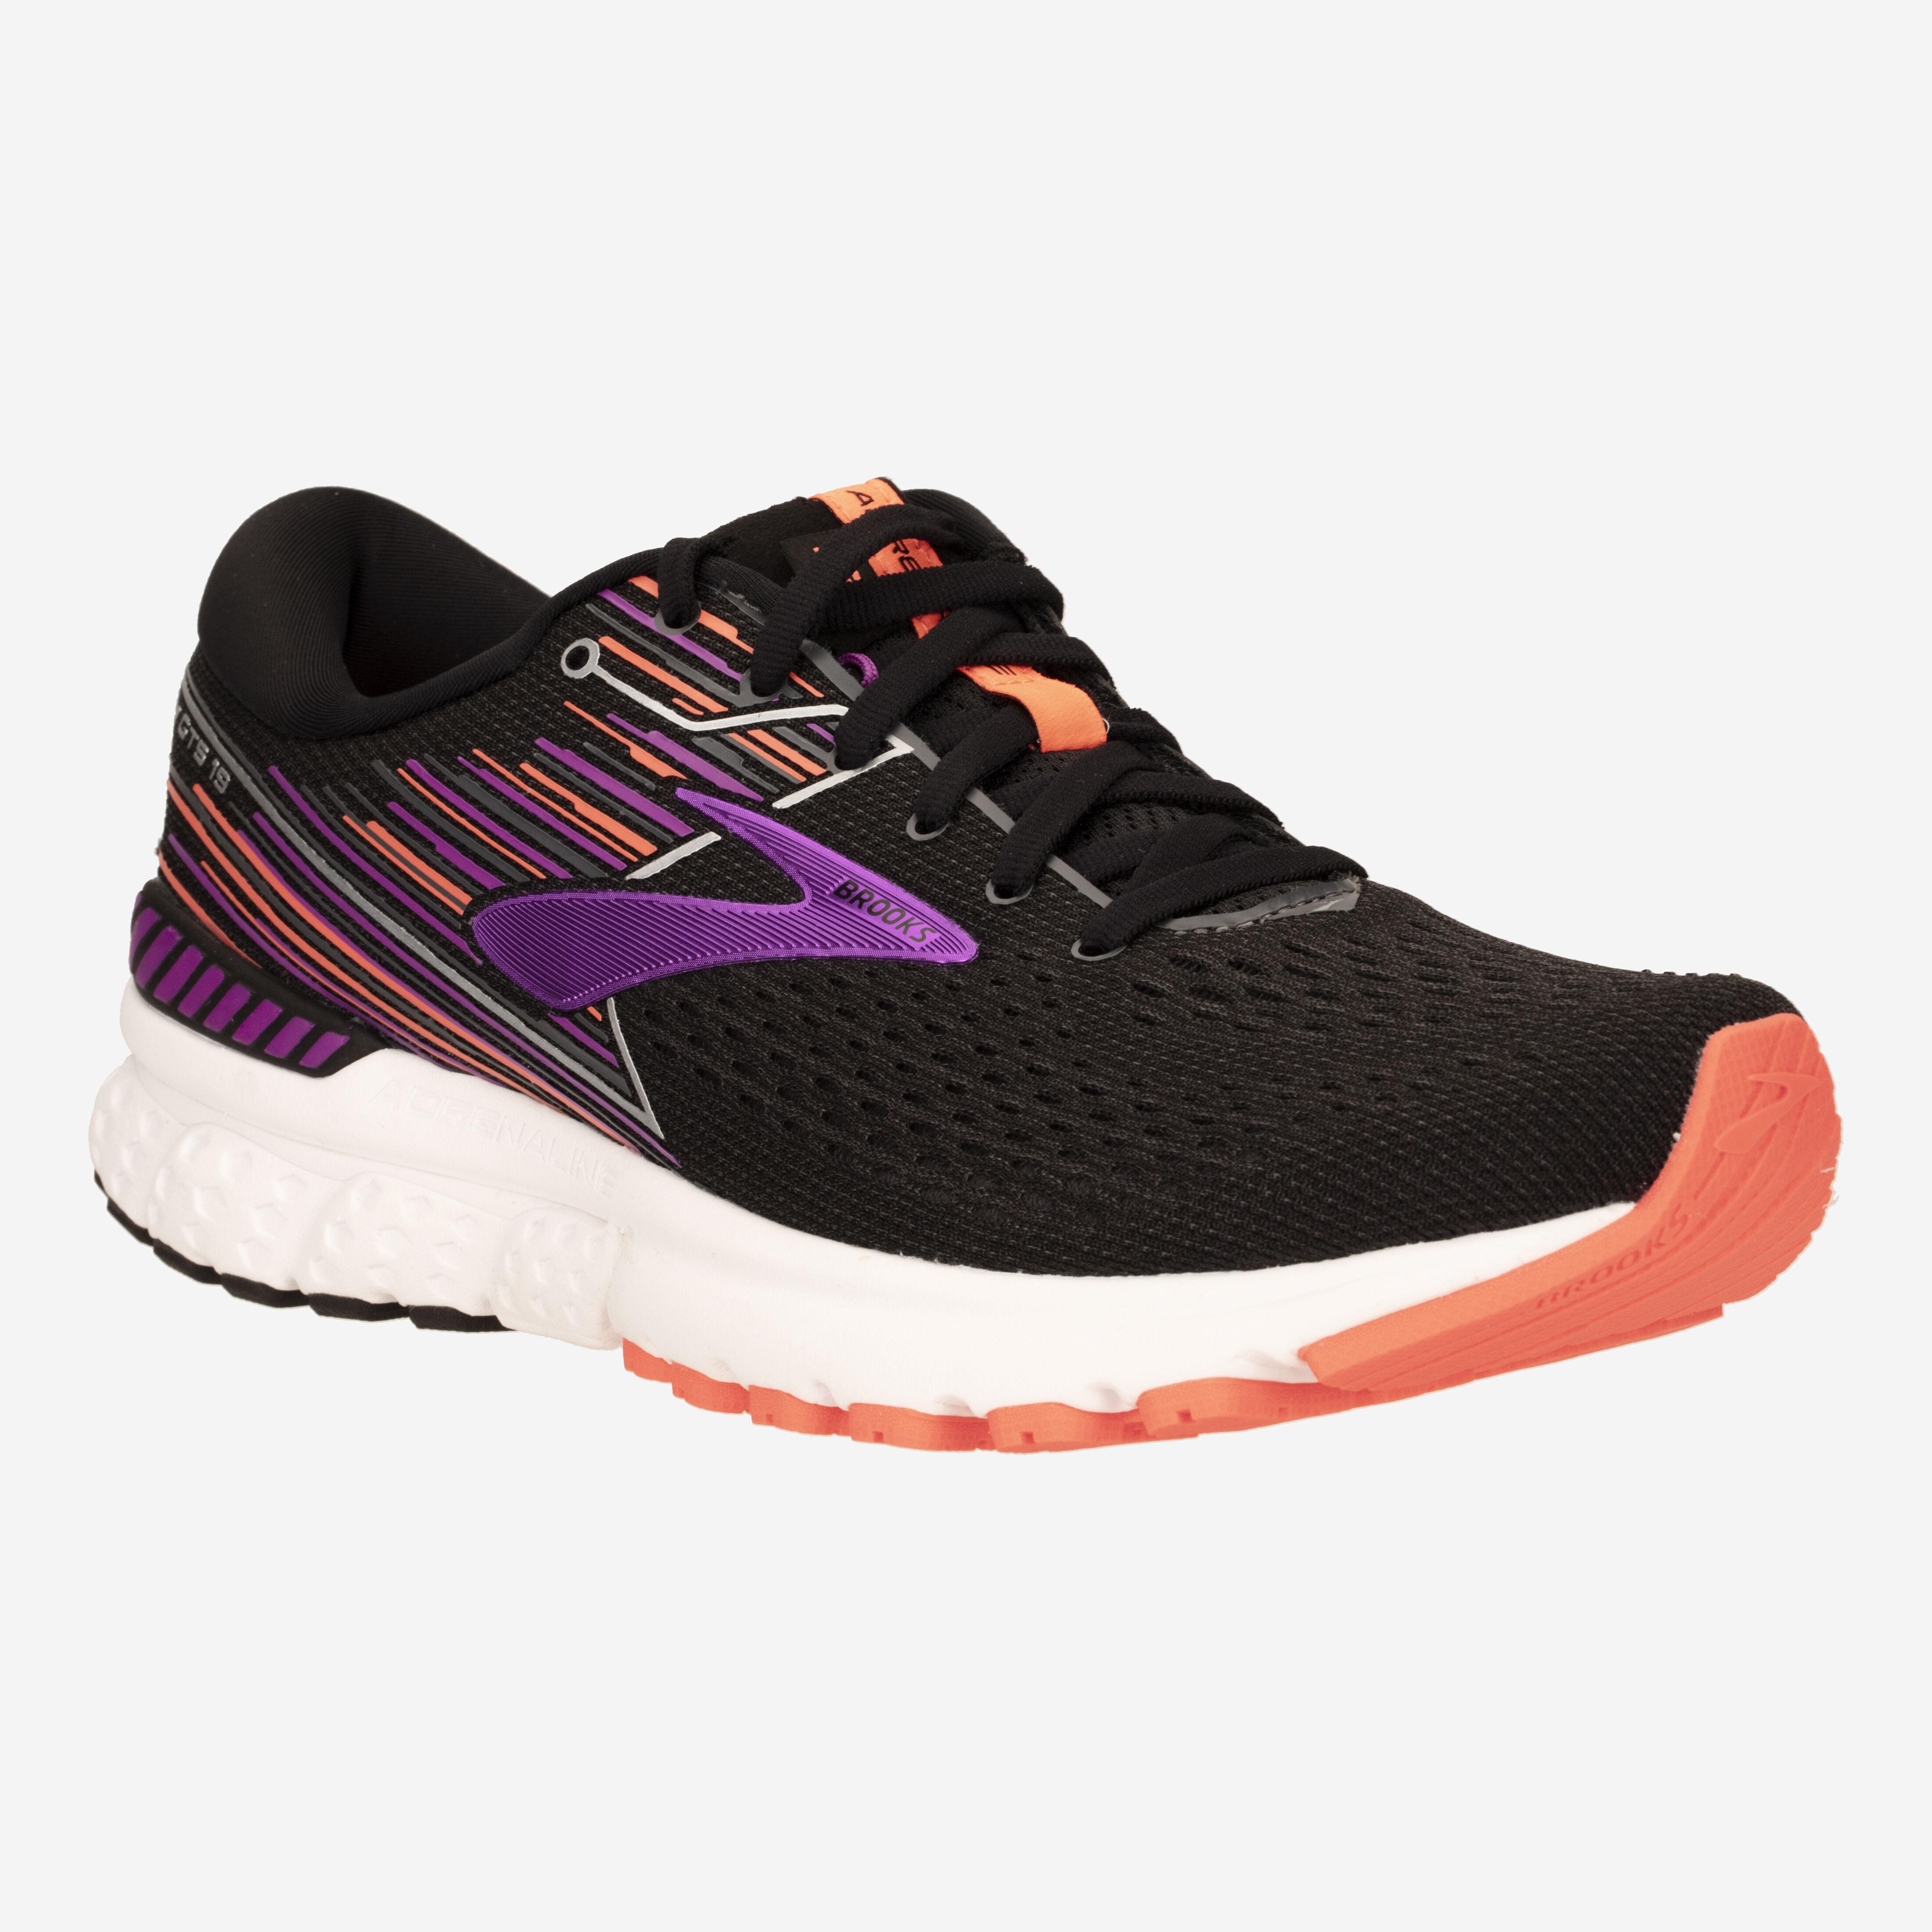 Brooks Adrenaline GTS 19 women shoes 2019 RUNKD online ...